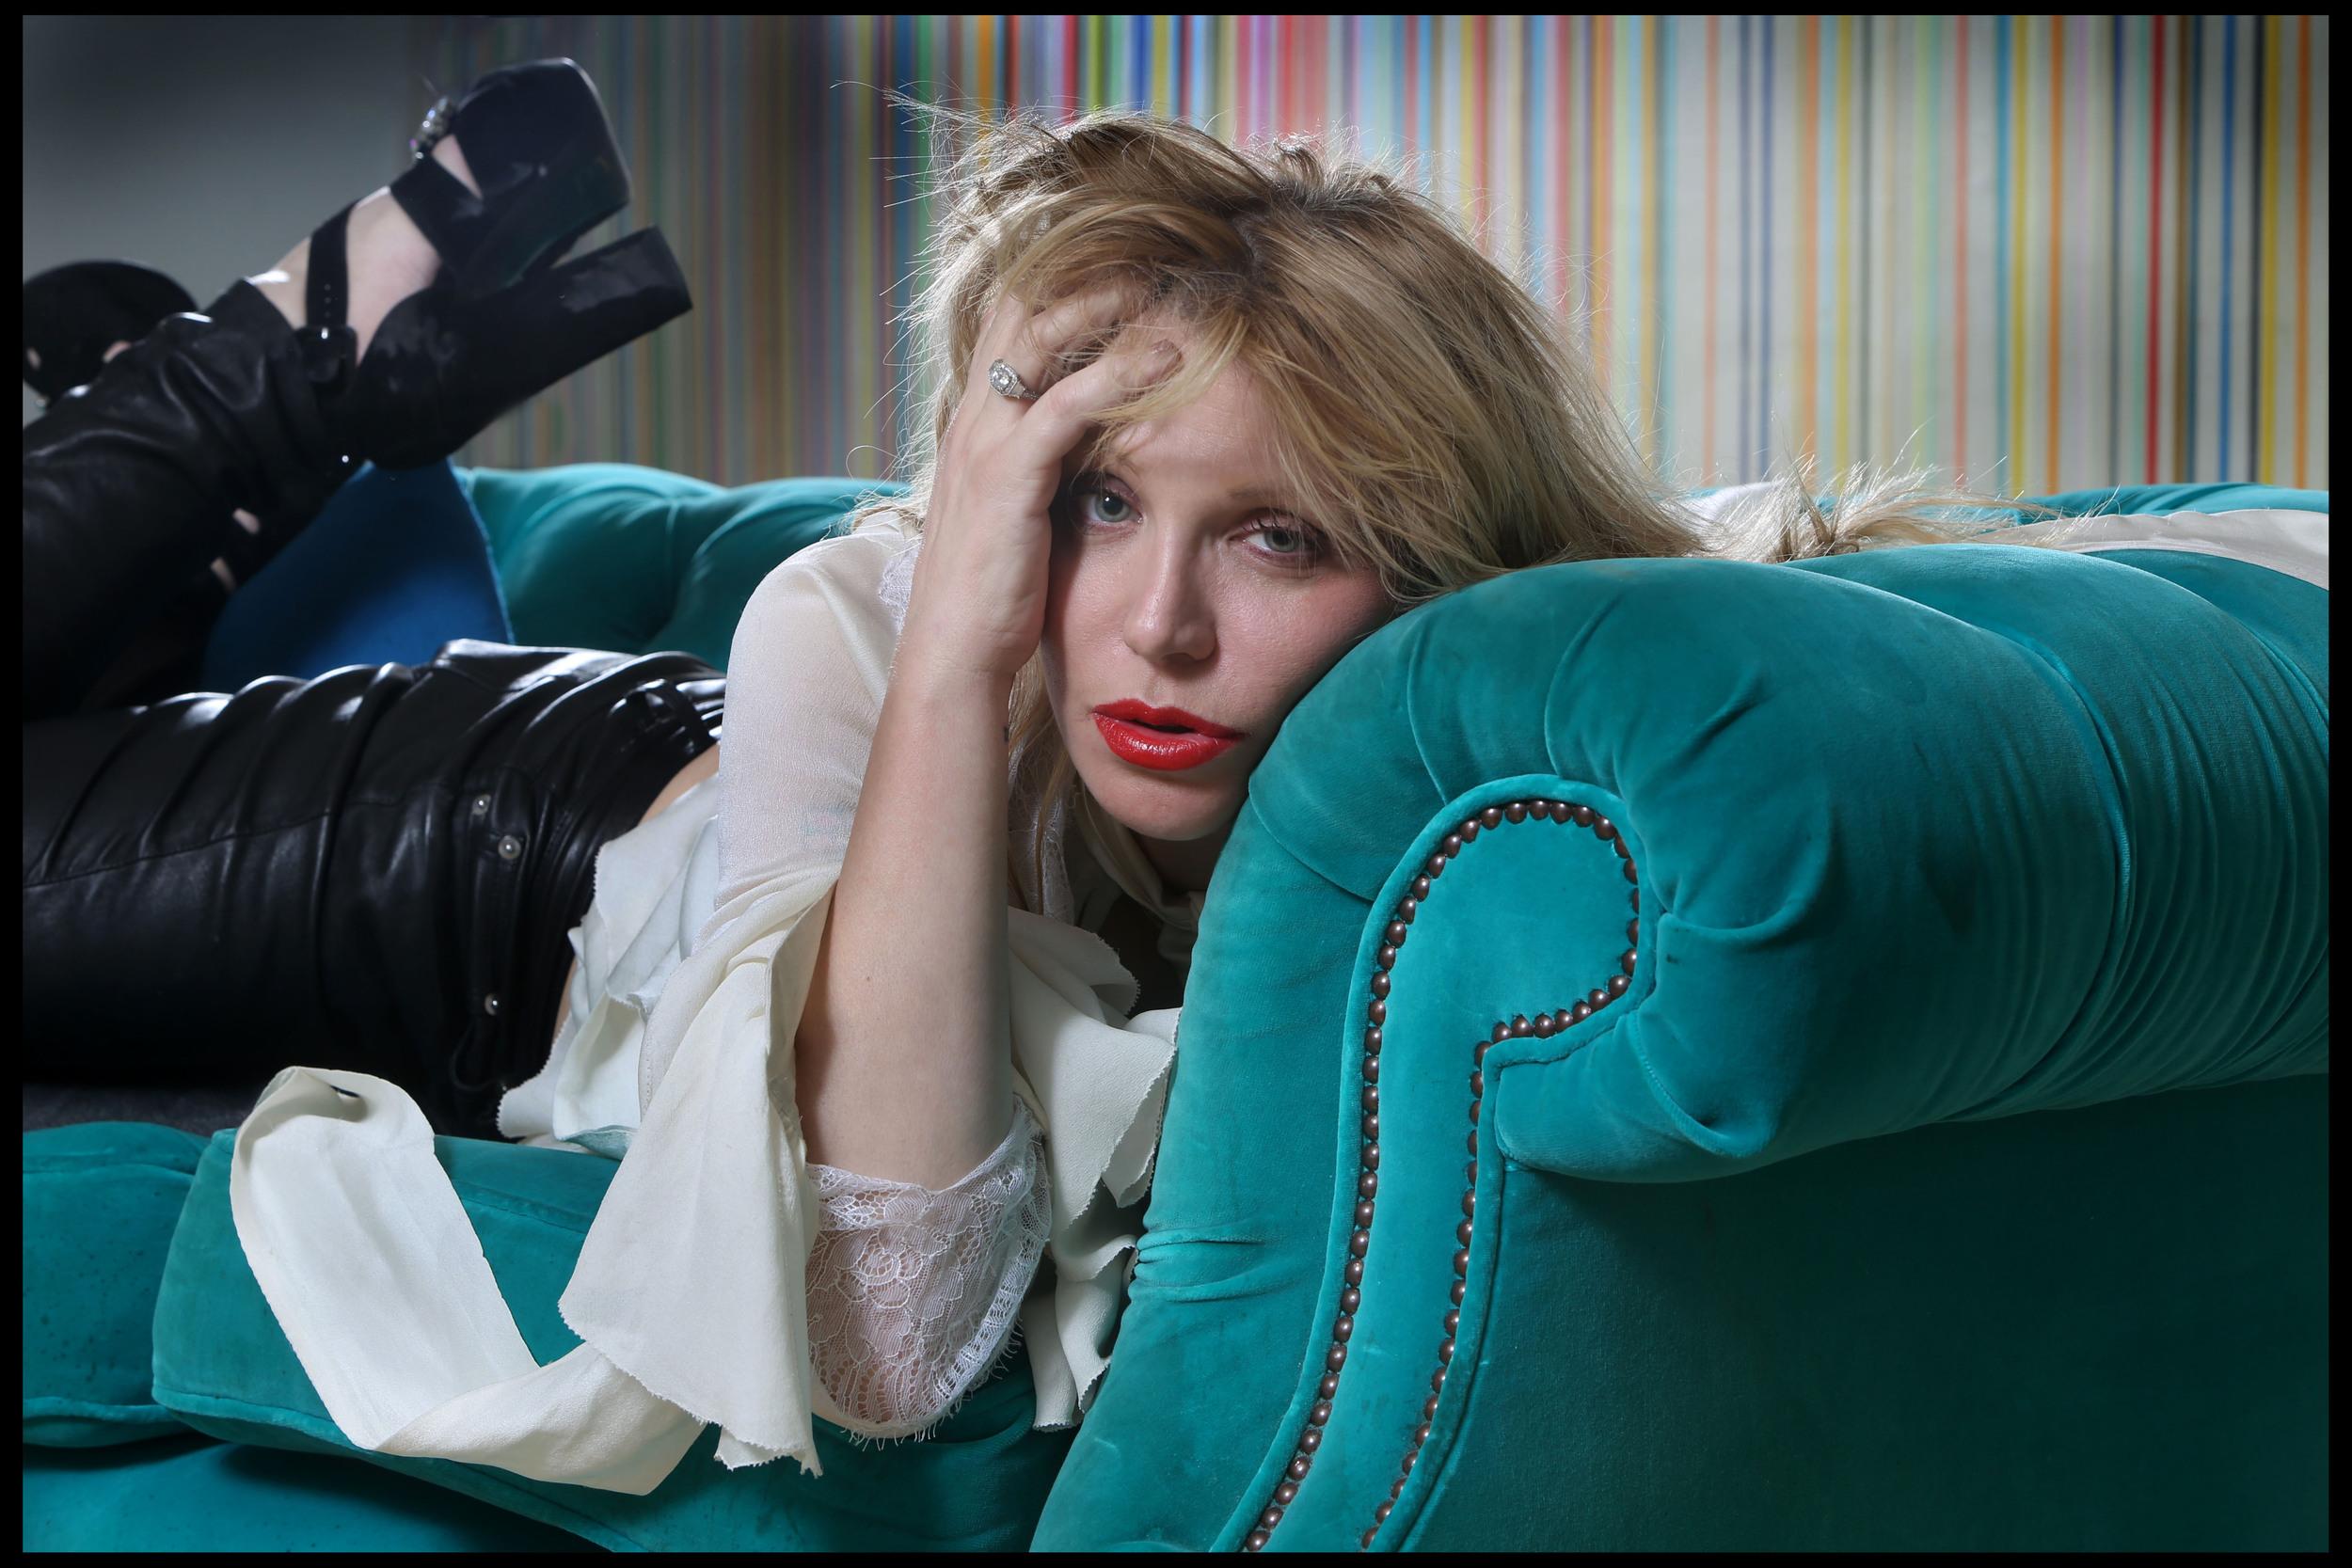 Courtney Love, musician